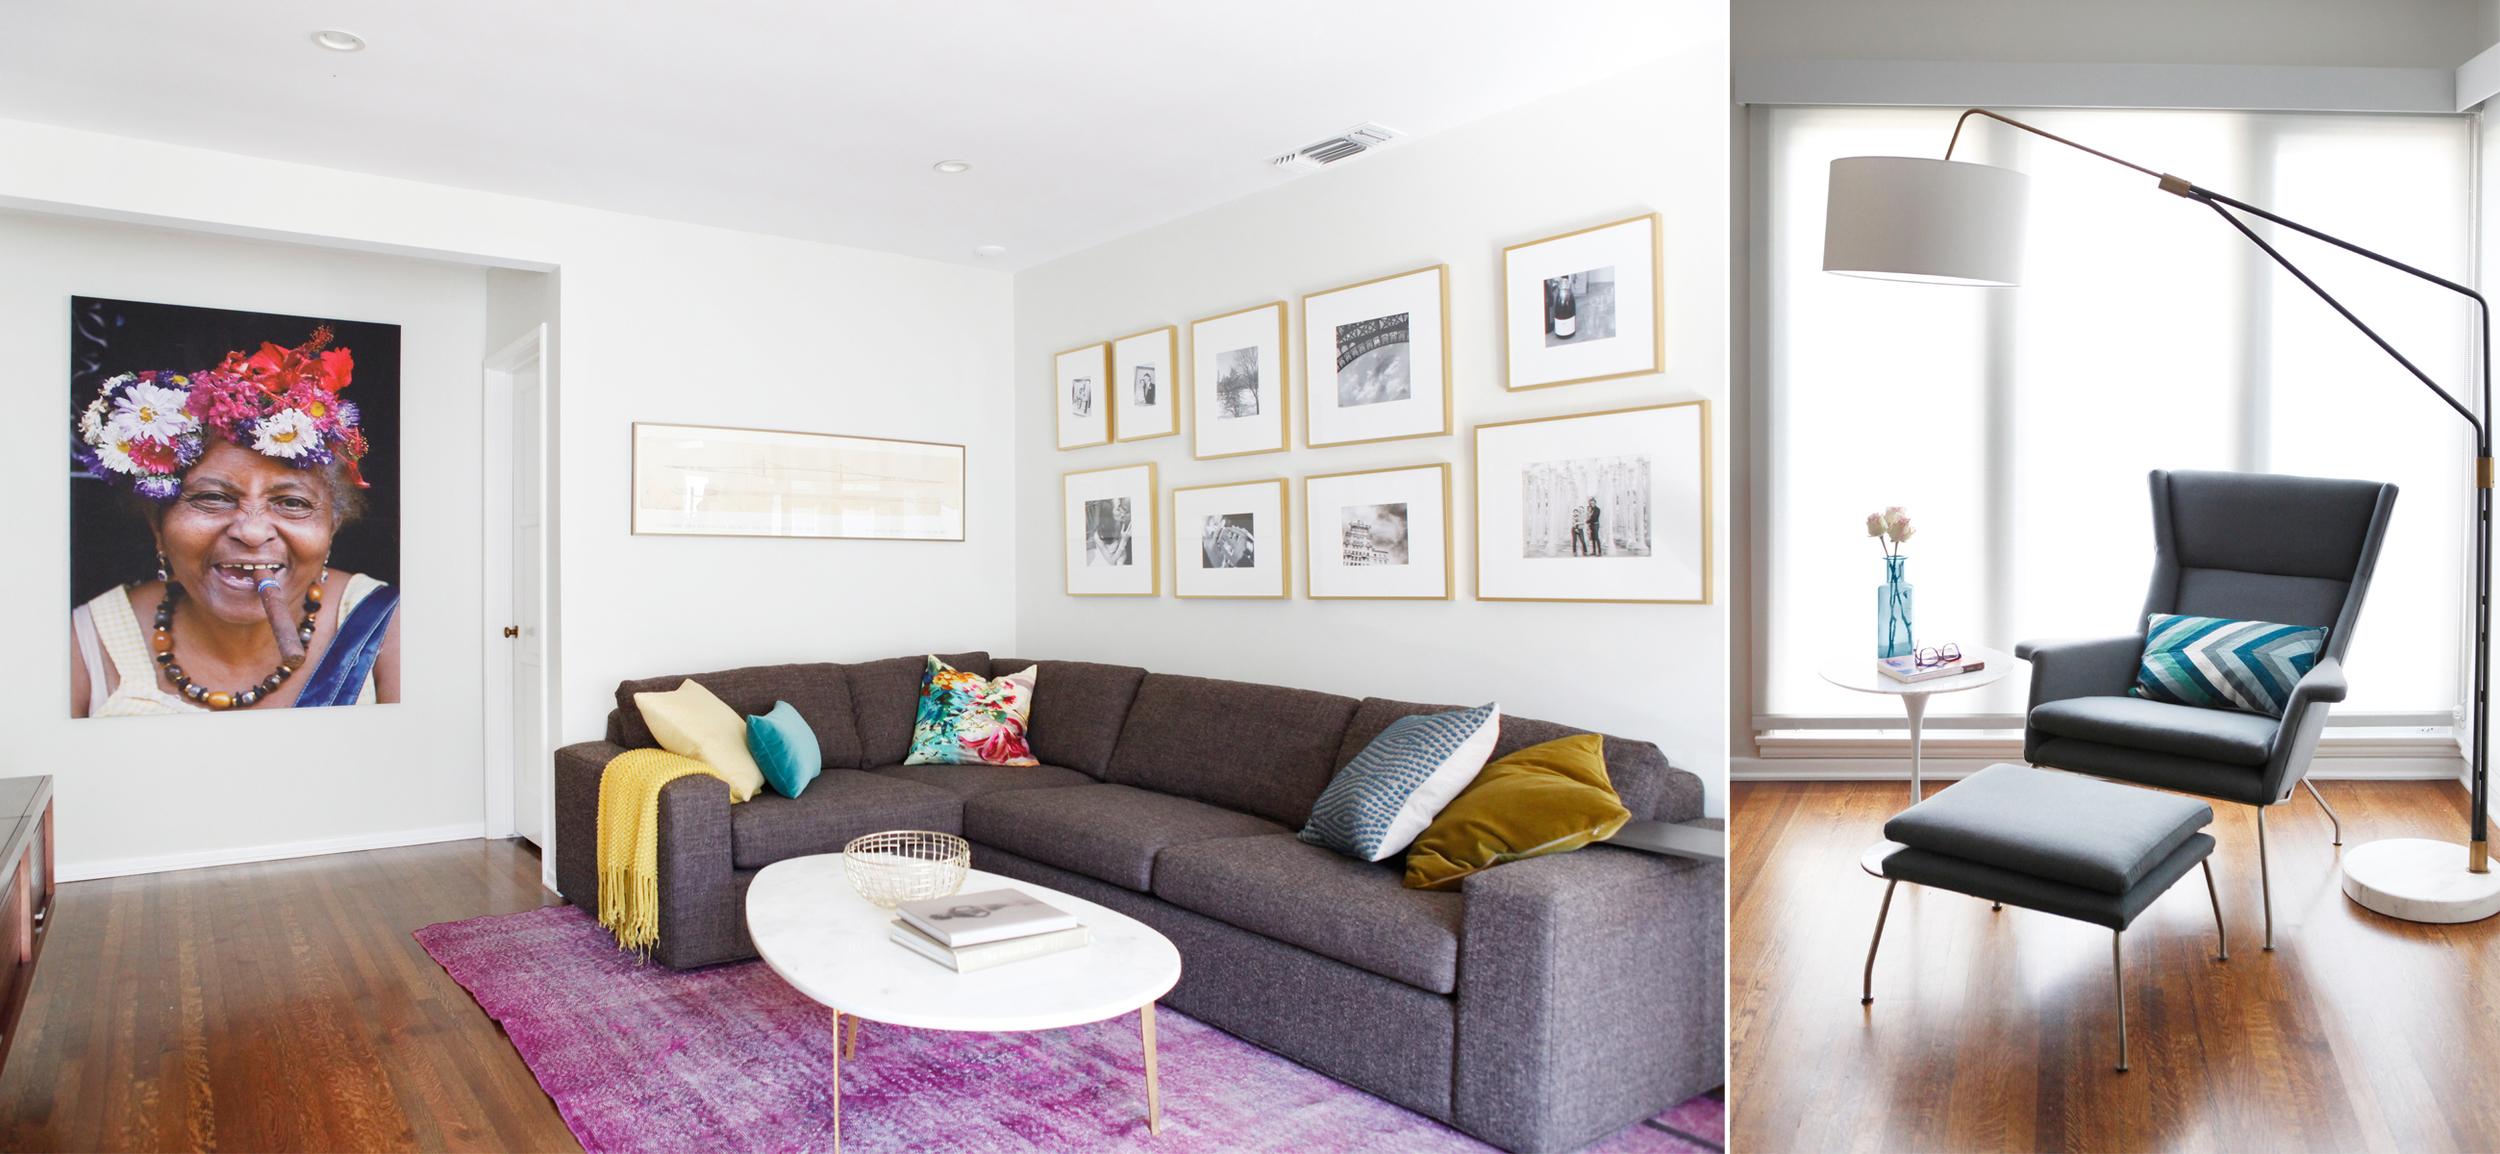 Modern Ecclectic Living Room Design.jpg